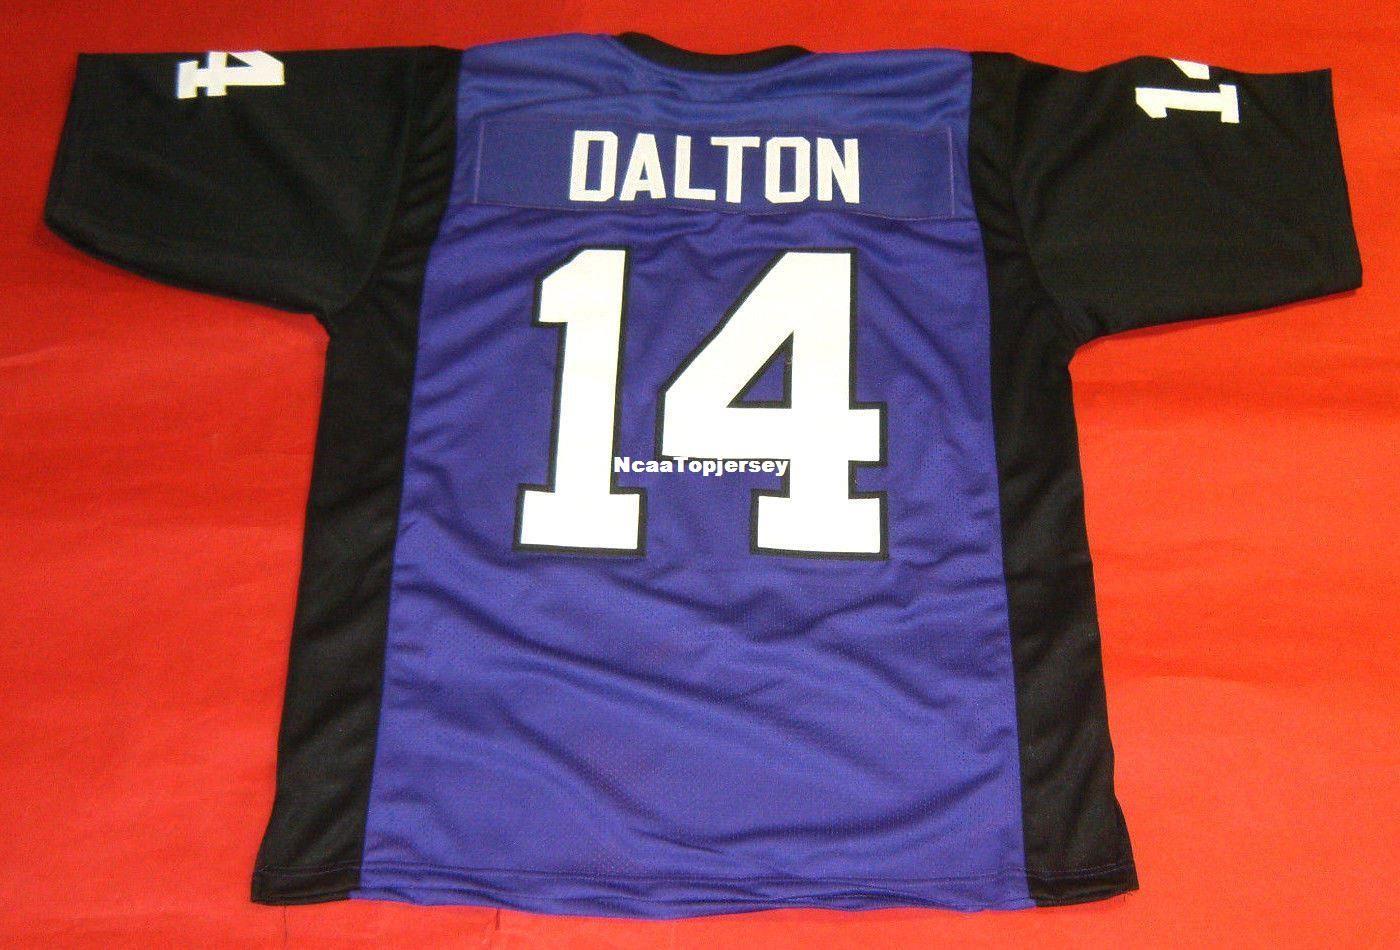 tcu andy dalton jersey